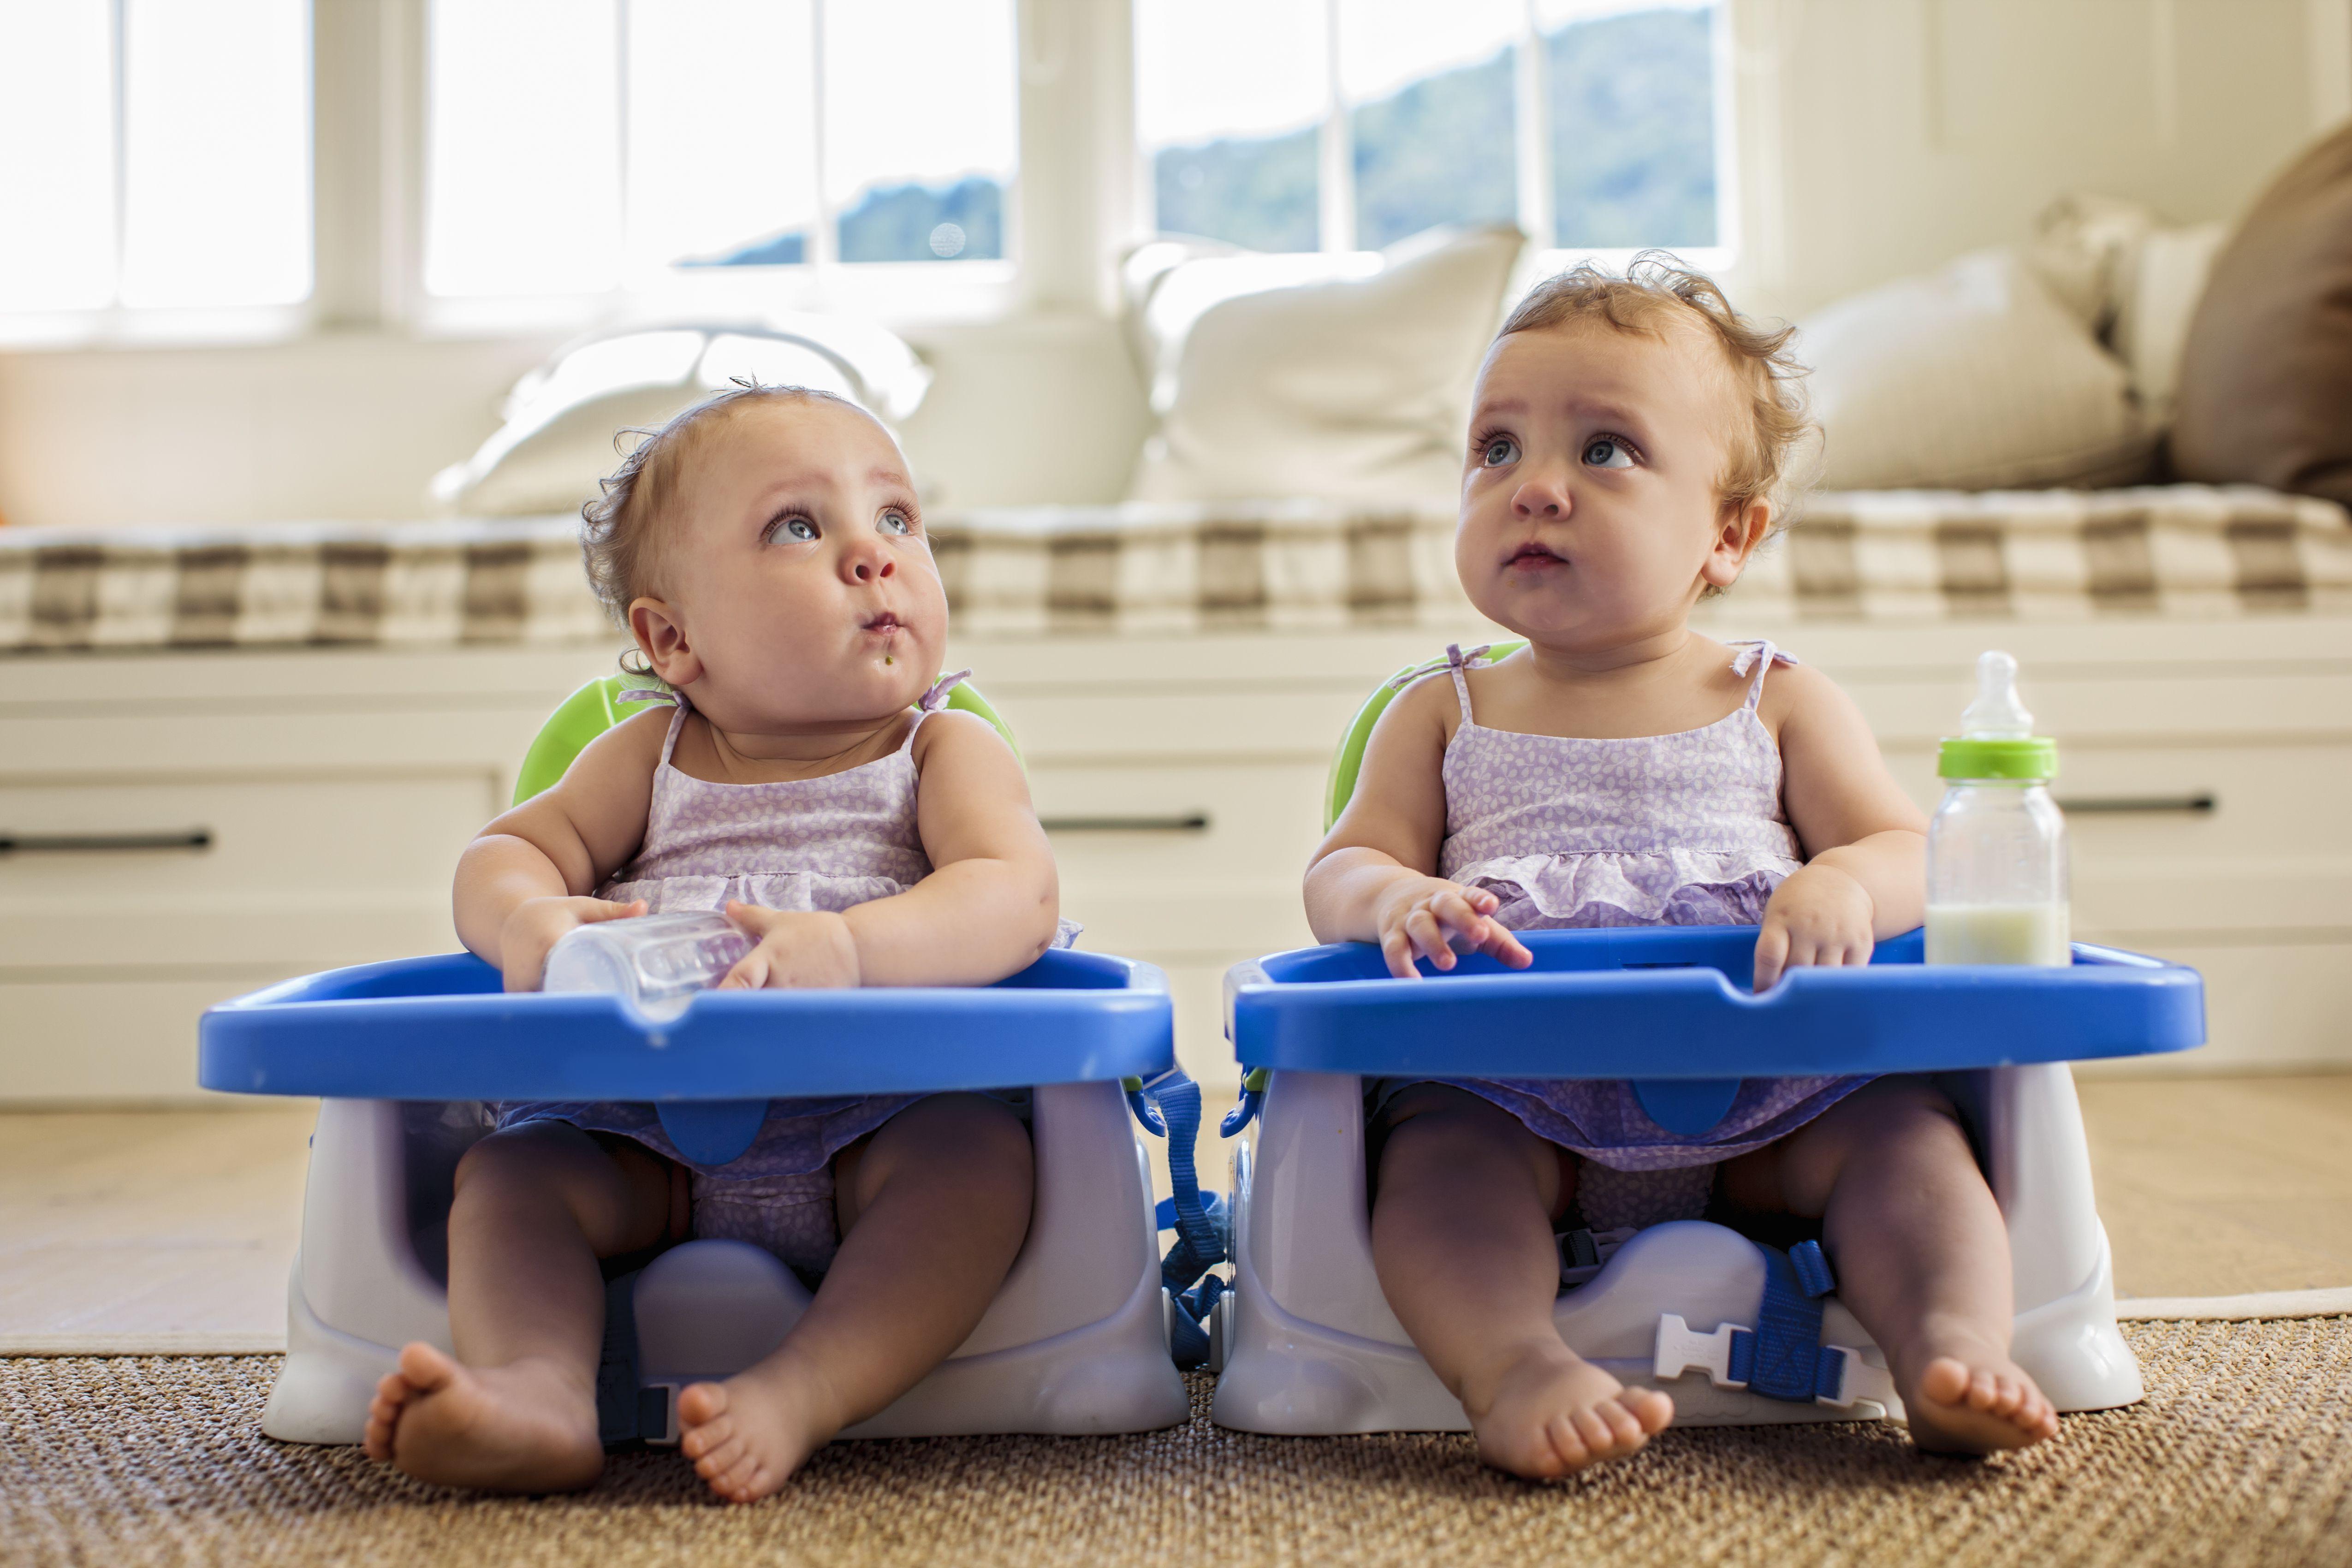 Twins sitting with milk